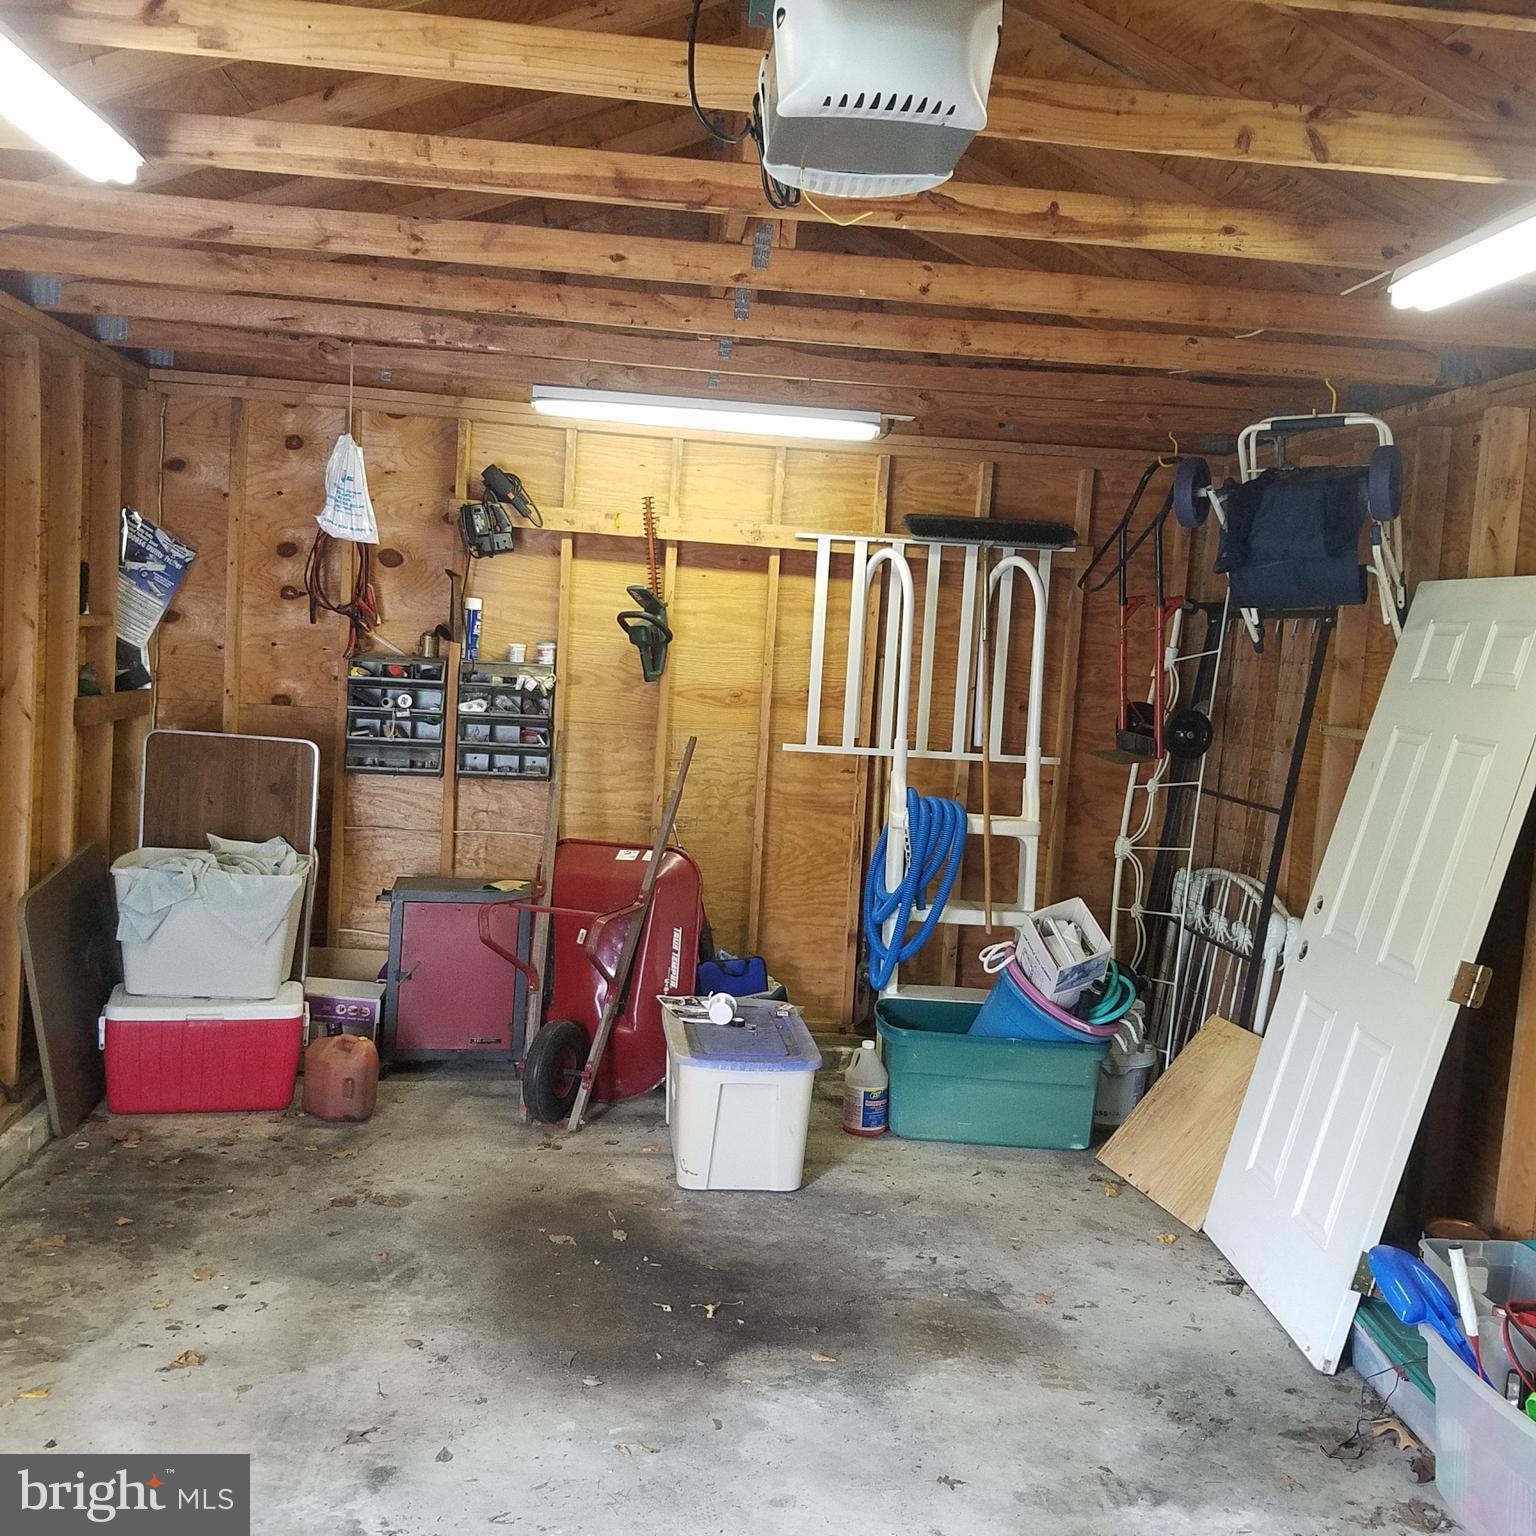 Apartments For Rent Glendora Ca: 1040 Rowand Avenue, Glendora, NJ 08029, MLS # NJCD363156